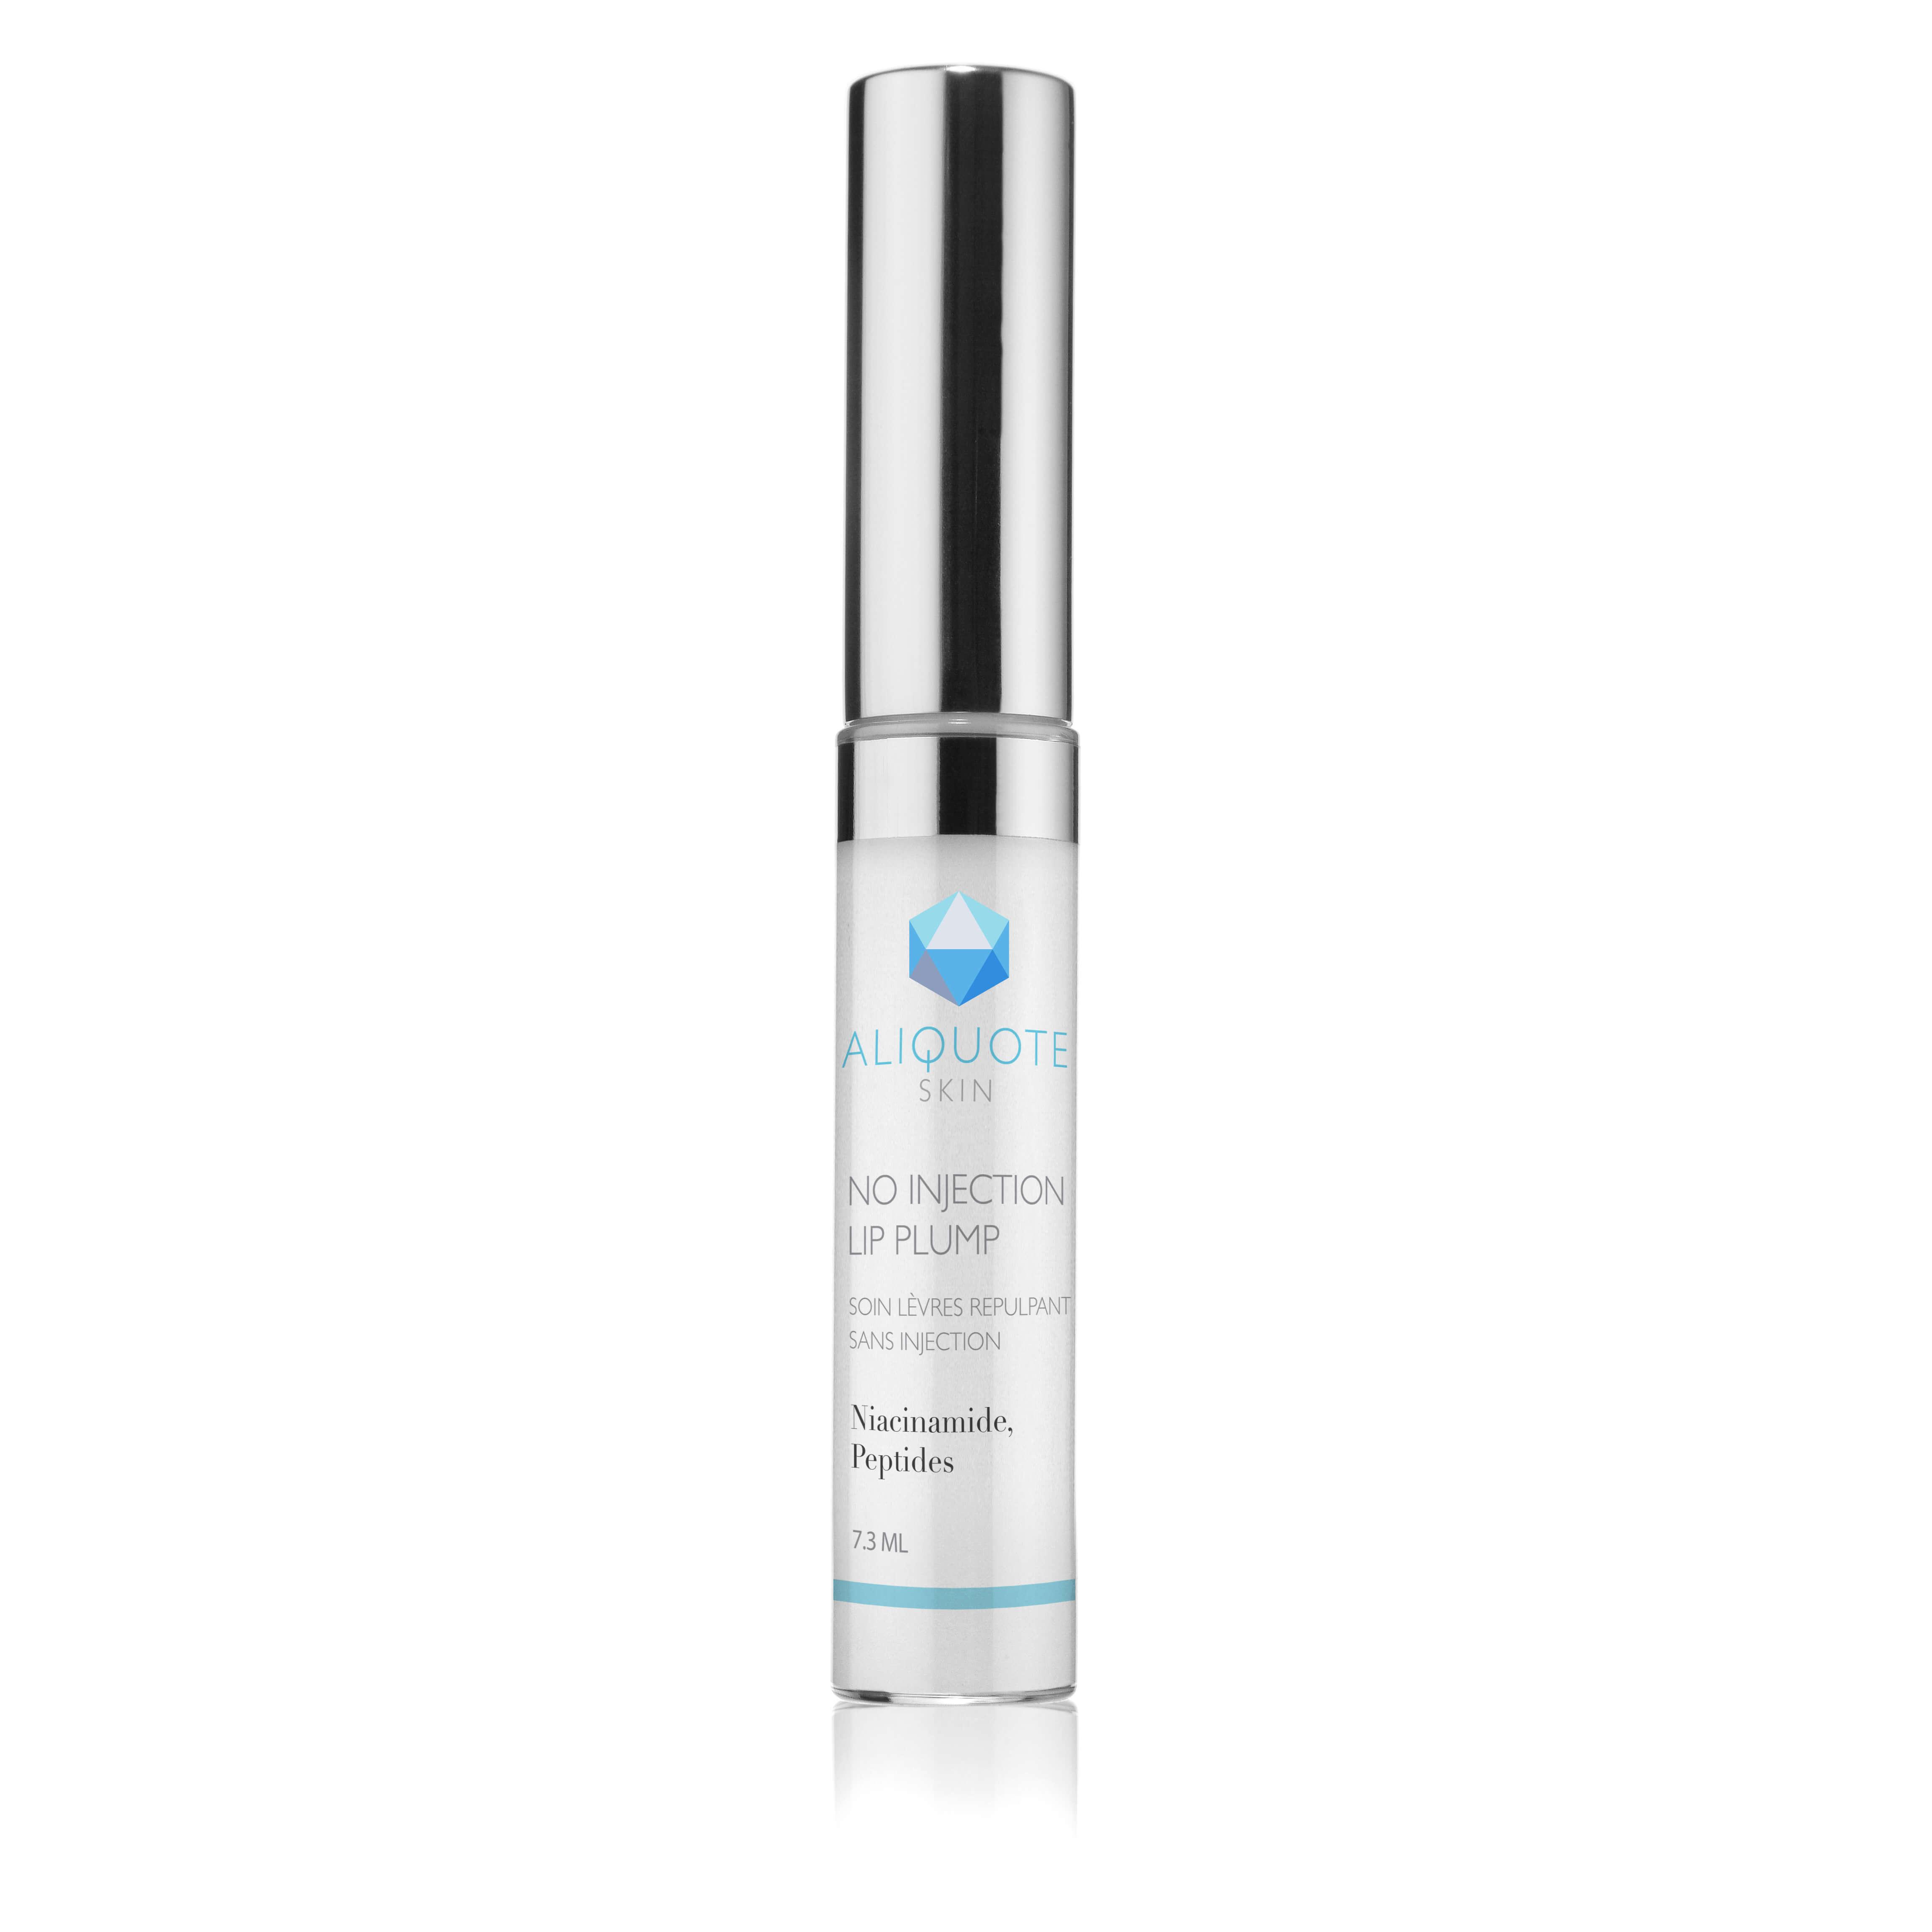 Aliquote Skin Lip Gloss Plumping